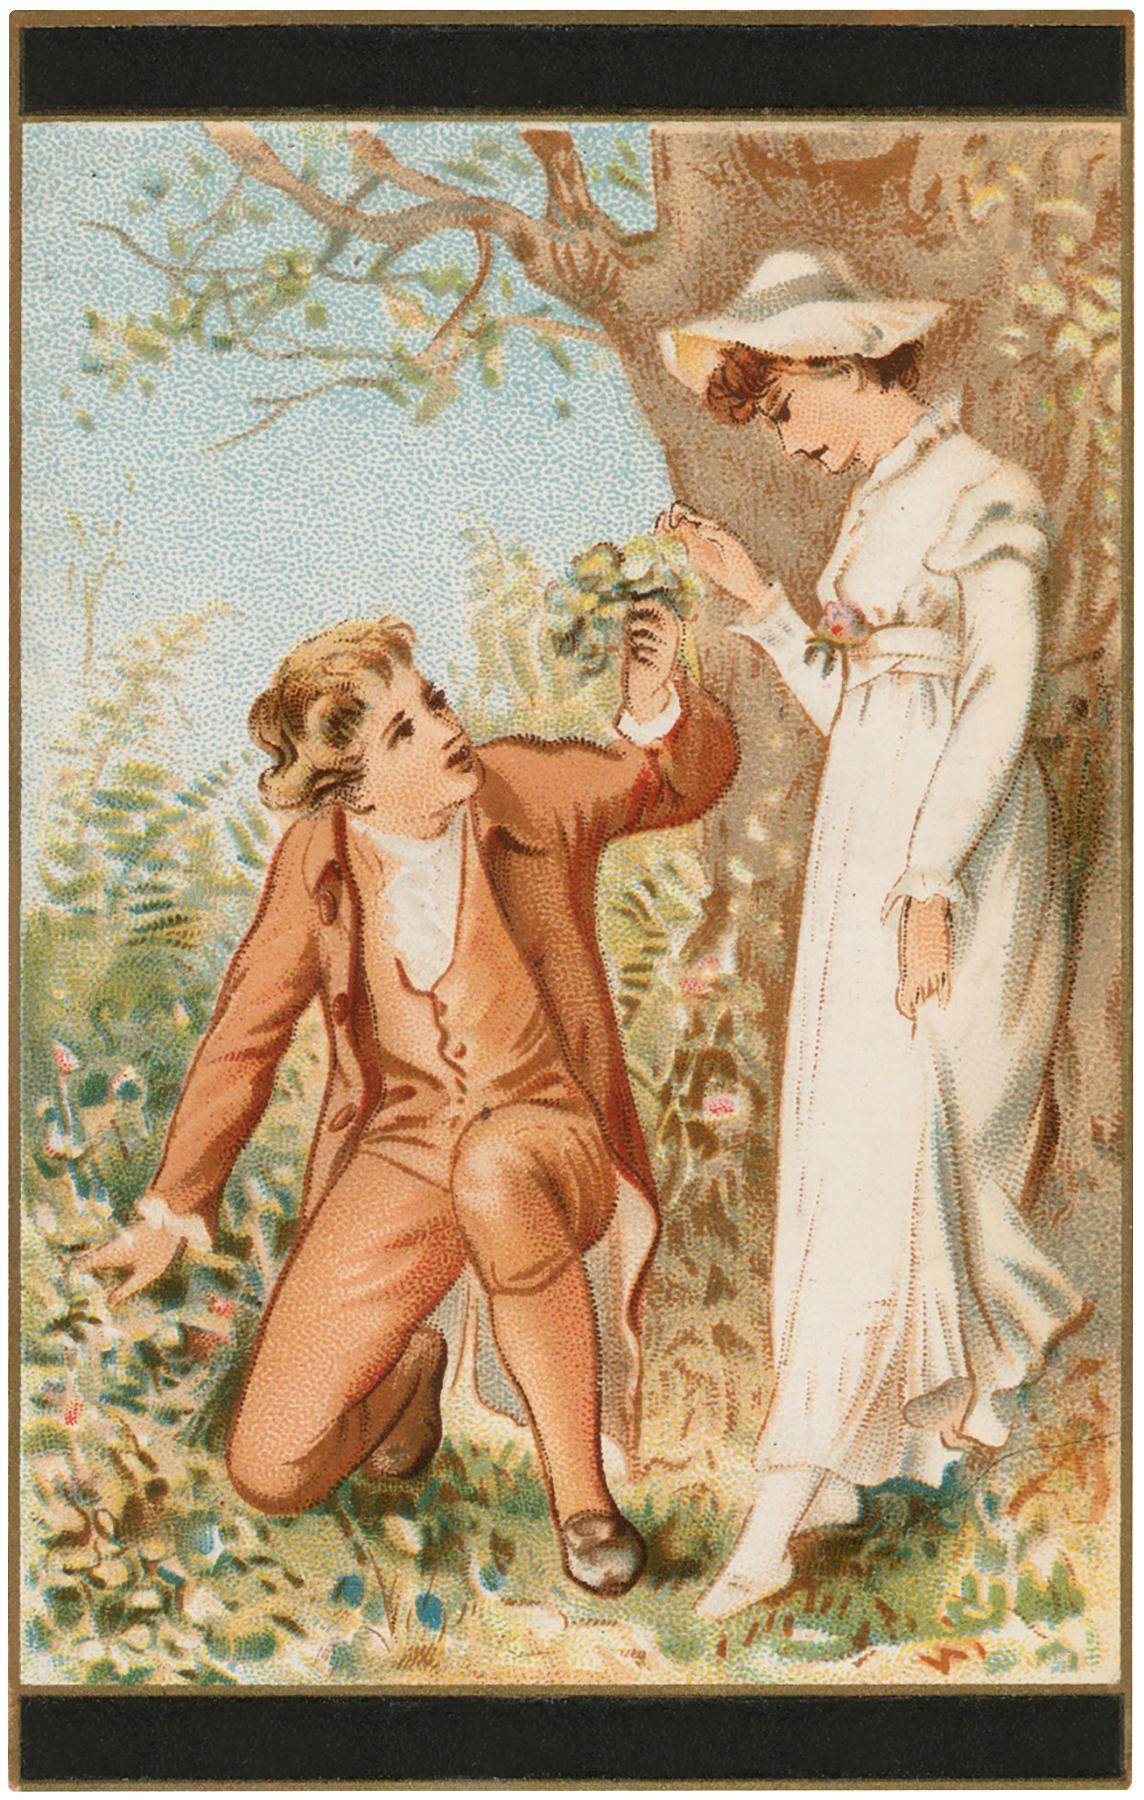 Romantic Fall Couple Image